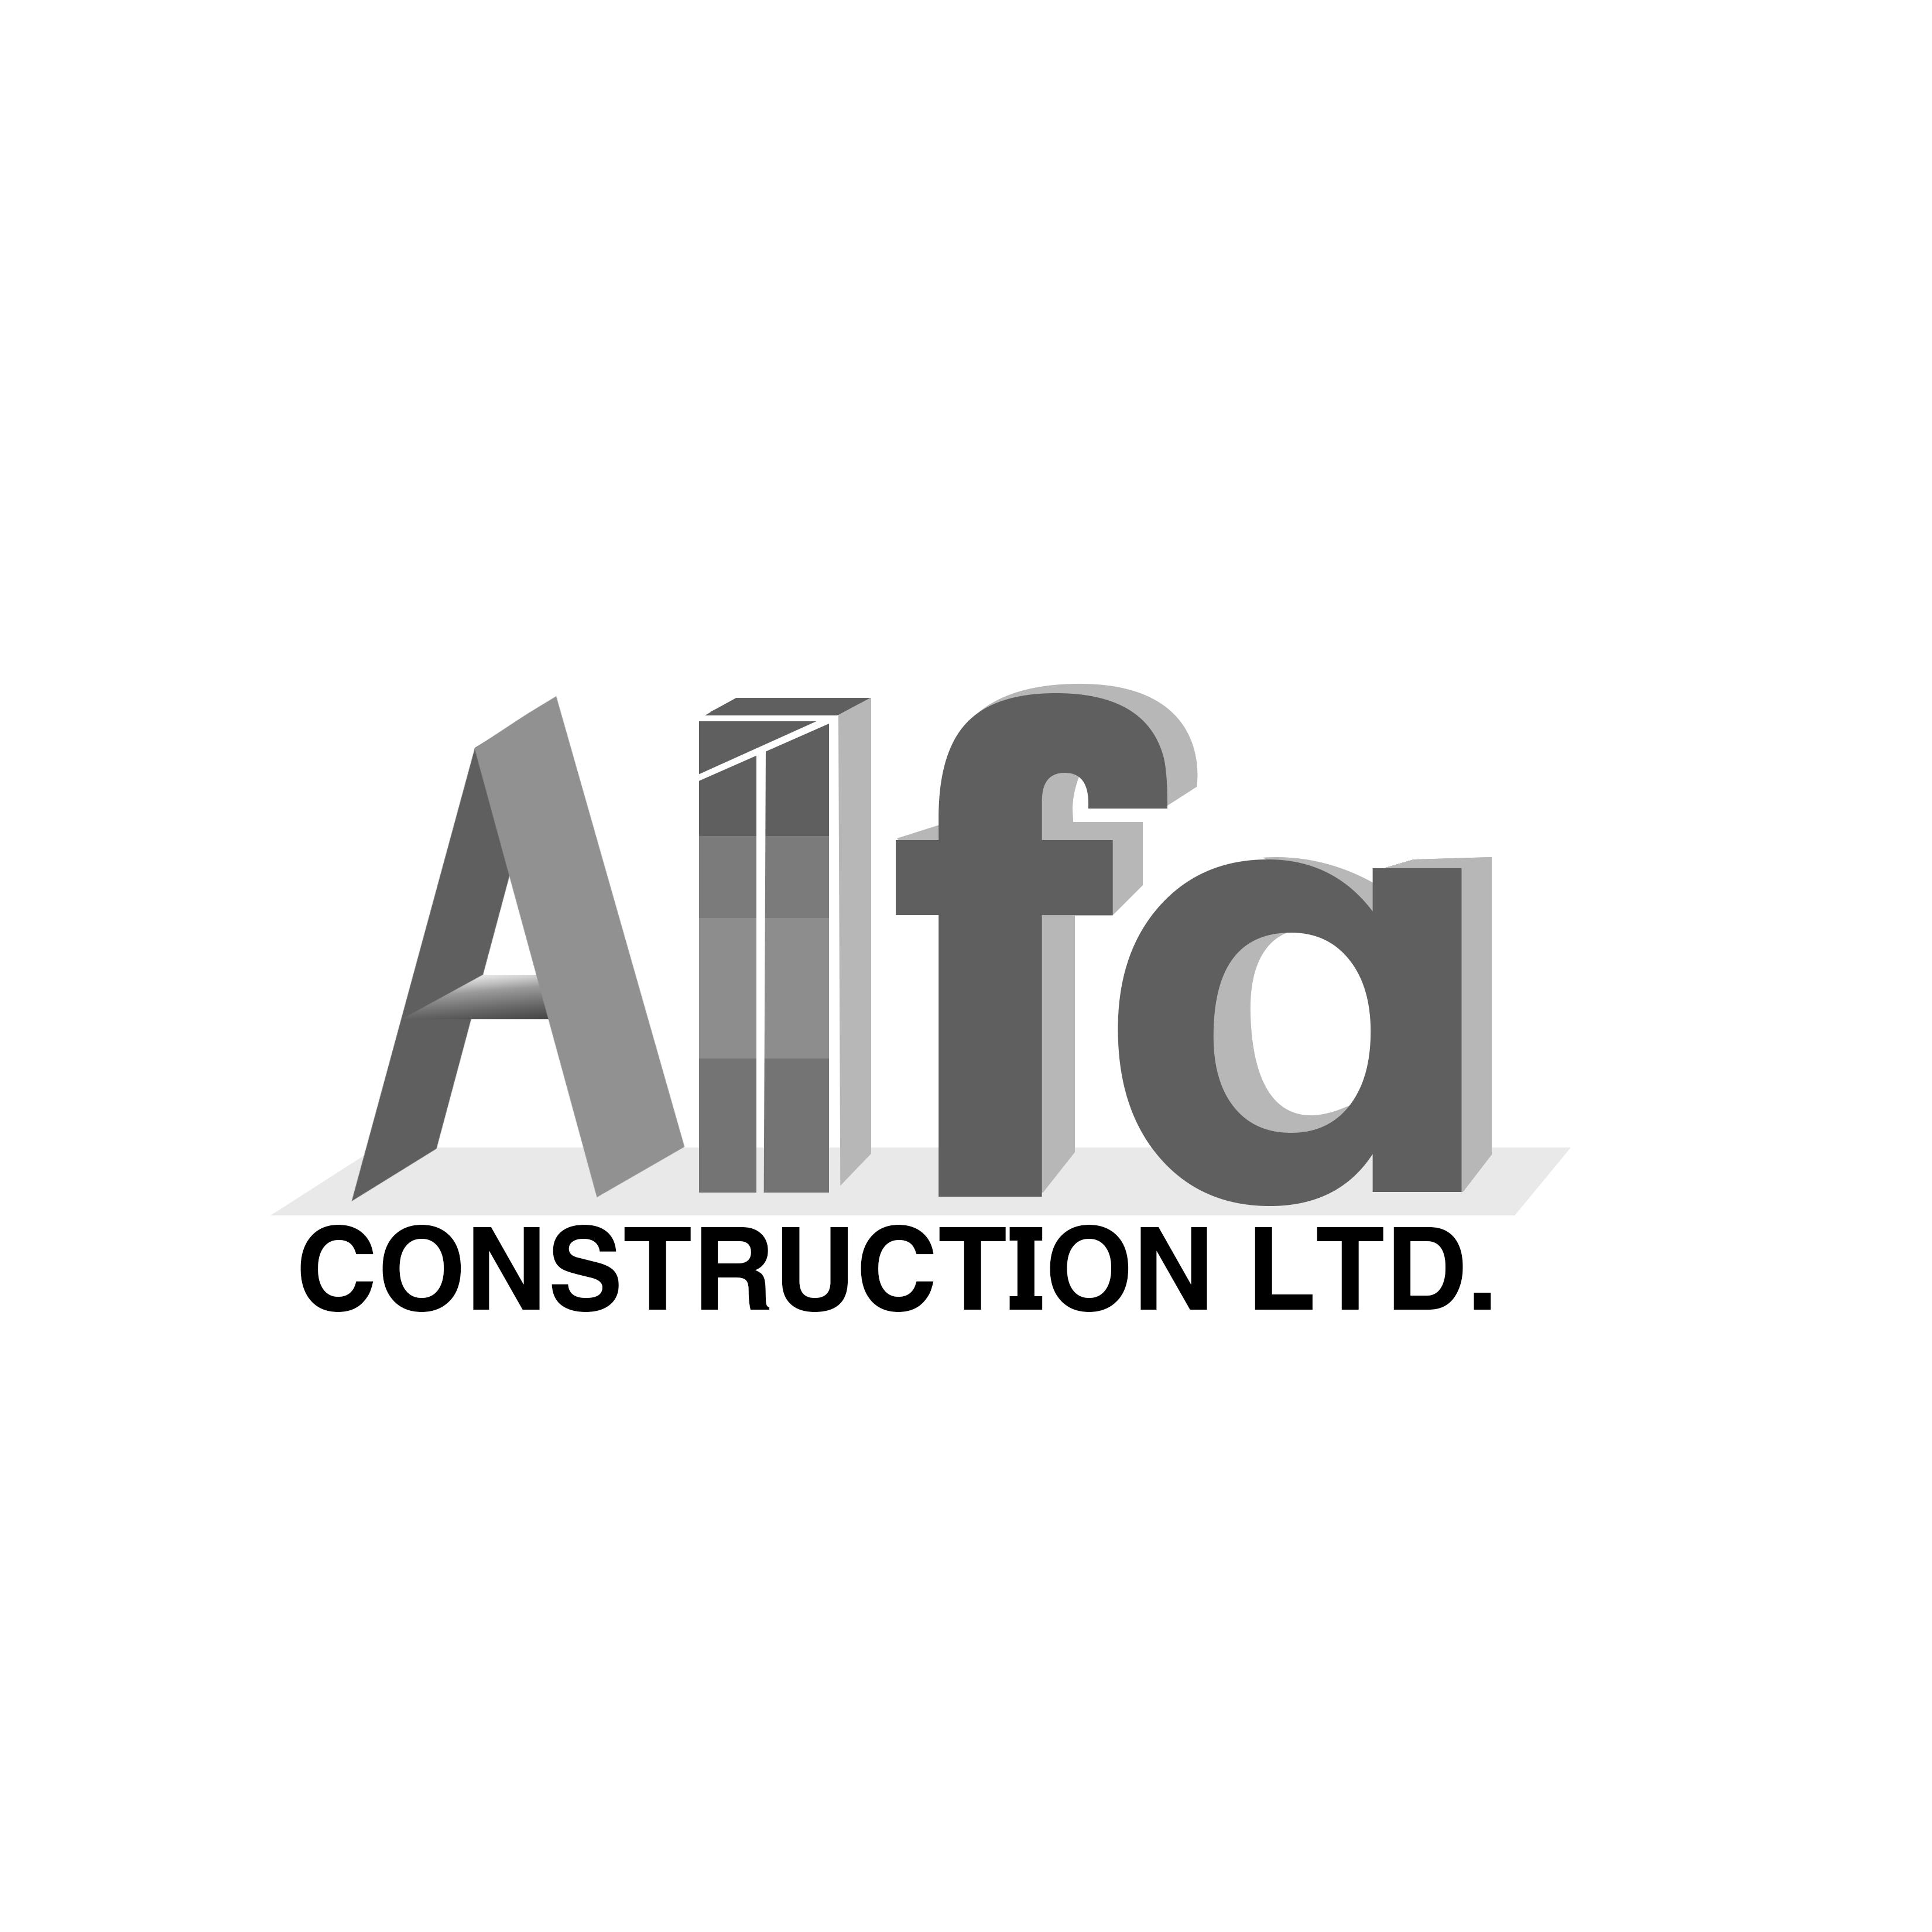 Logo Design by Allan Esclamado - Entry No. 5 in the Logo Design Contest Fun Logo Design for Alfa Construction Ltd.